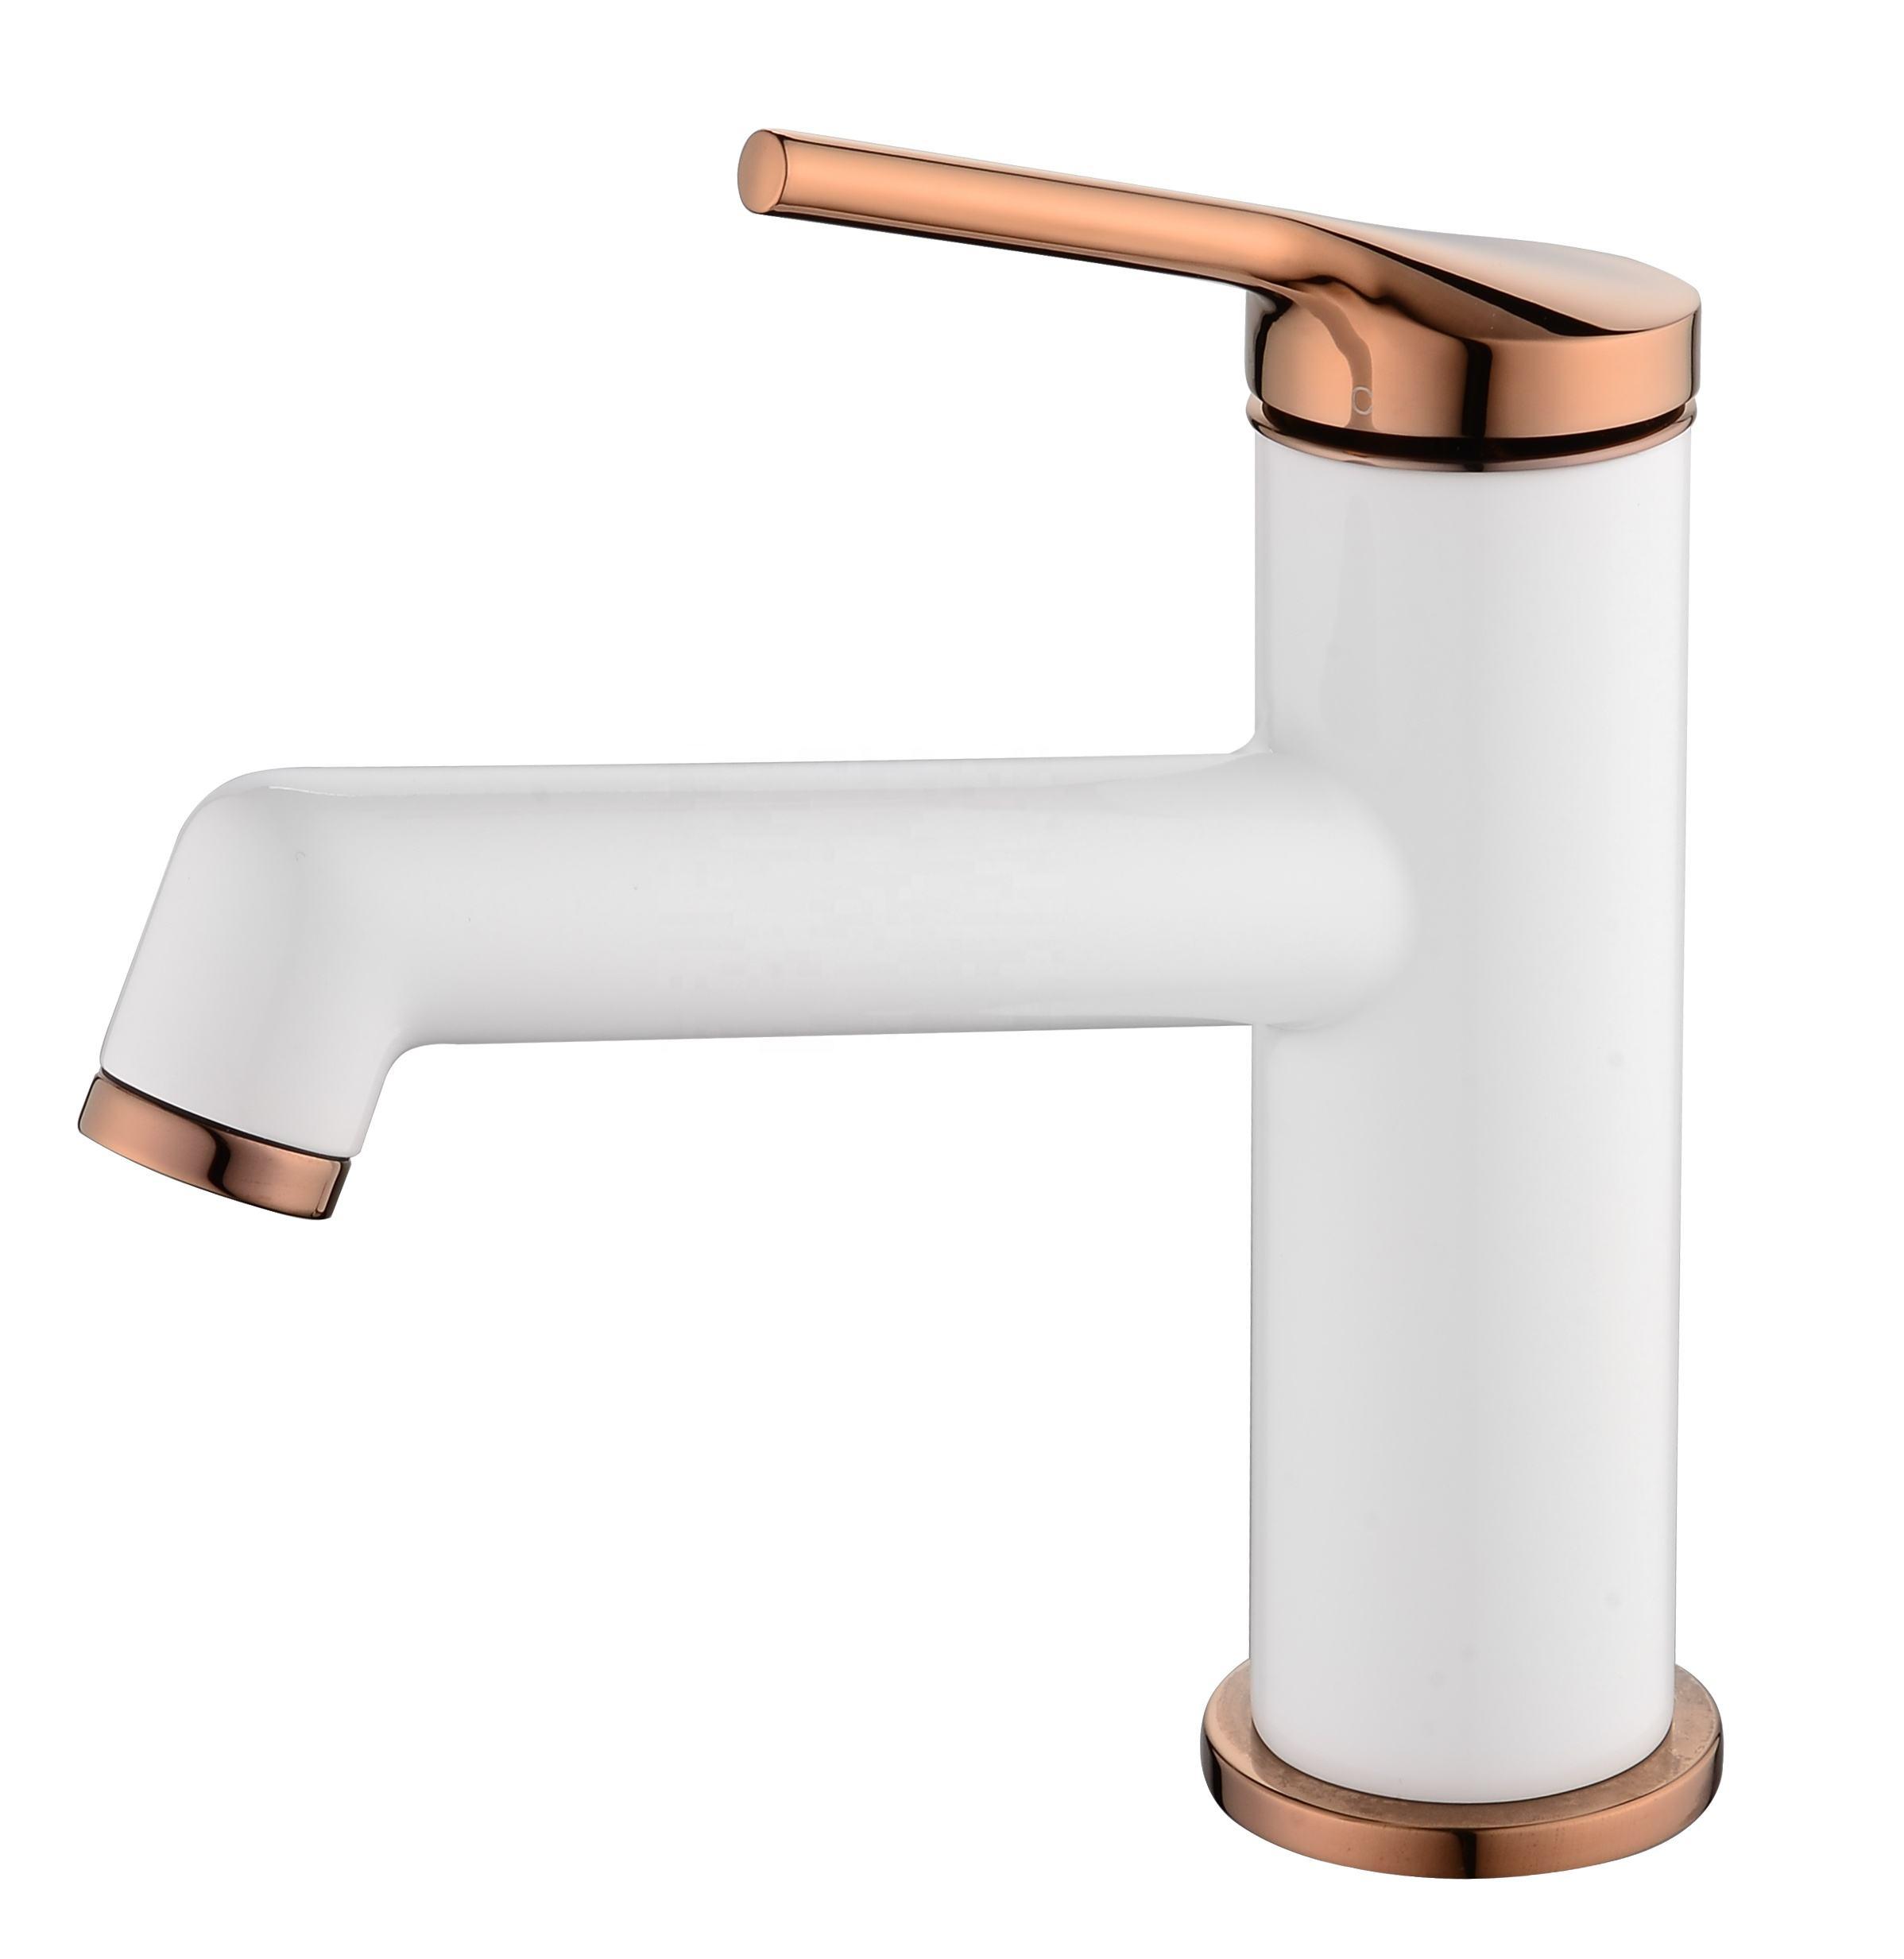 High End Chrome Deck Mounted Brass Gooseneck Kitchen Sink Mixing Tap Faucet